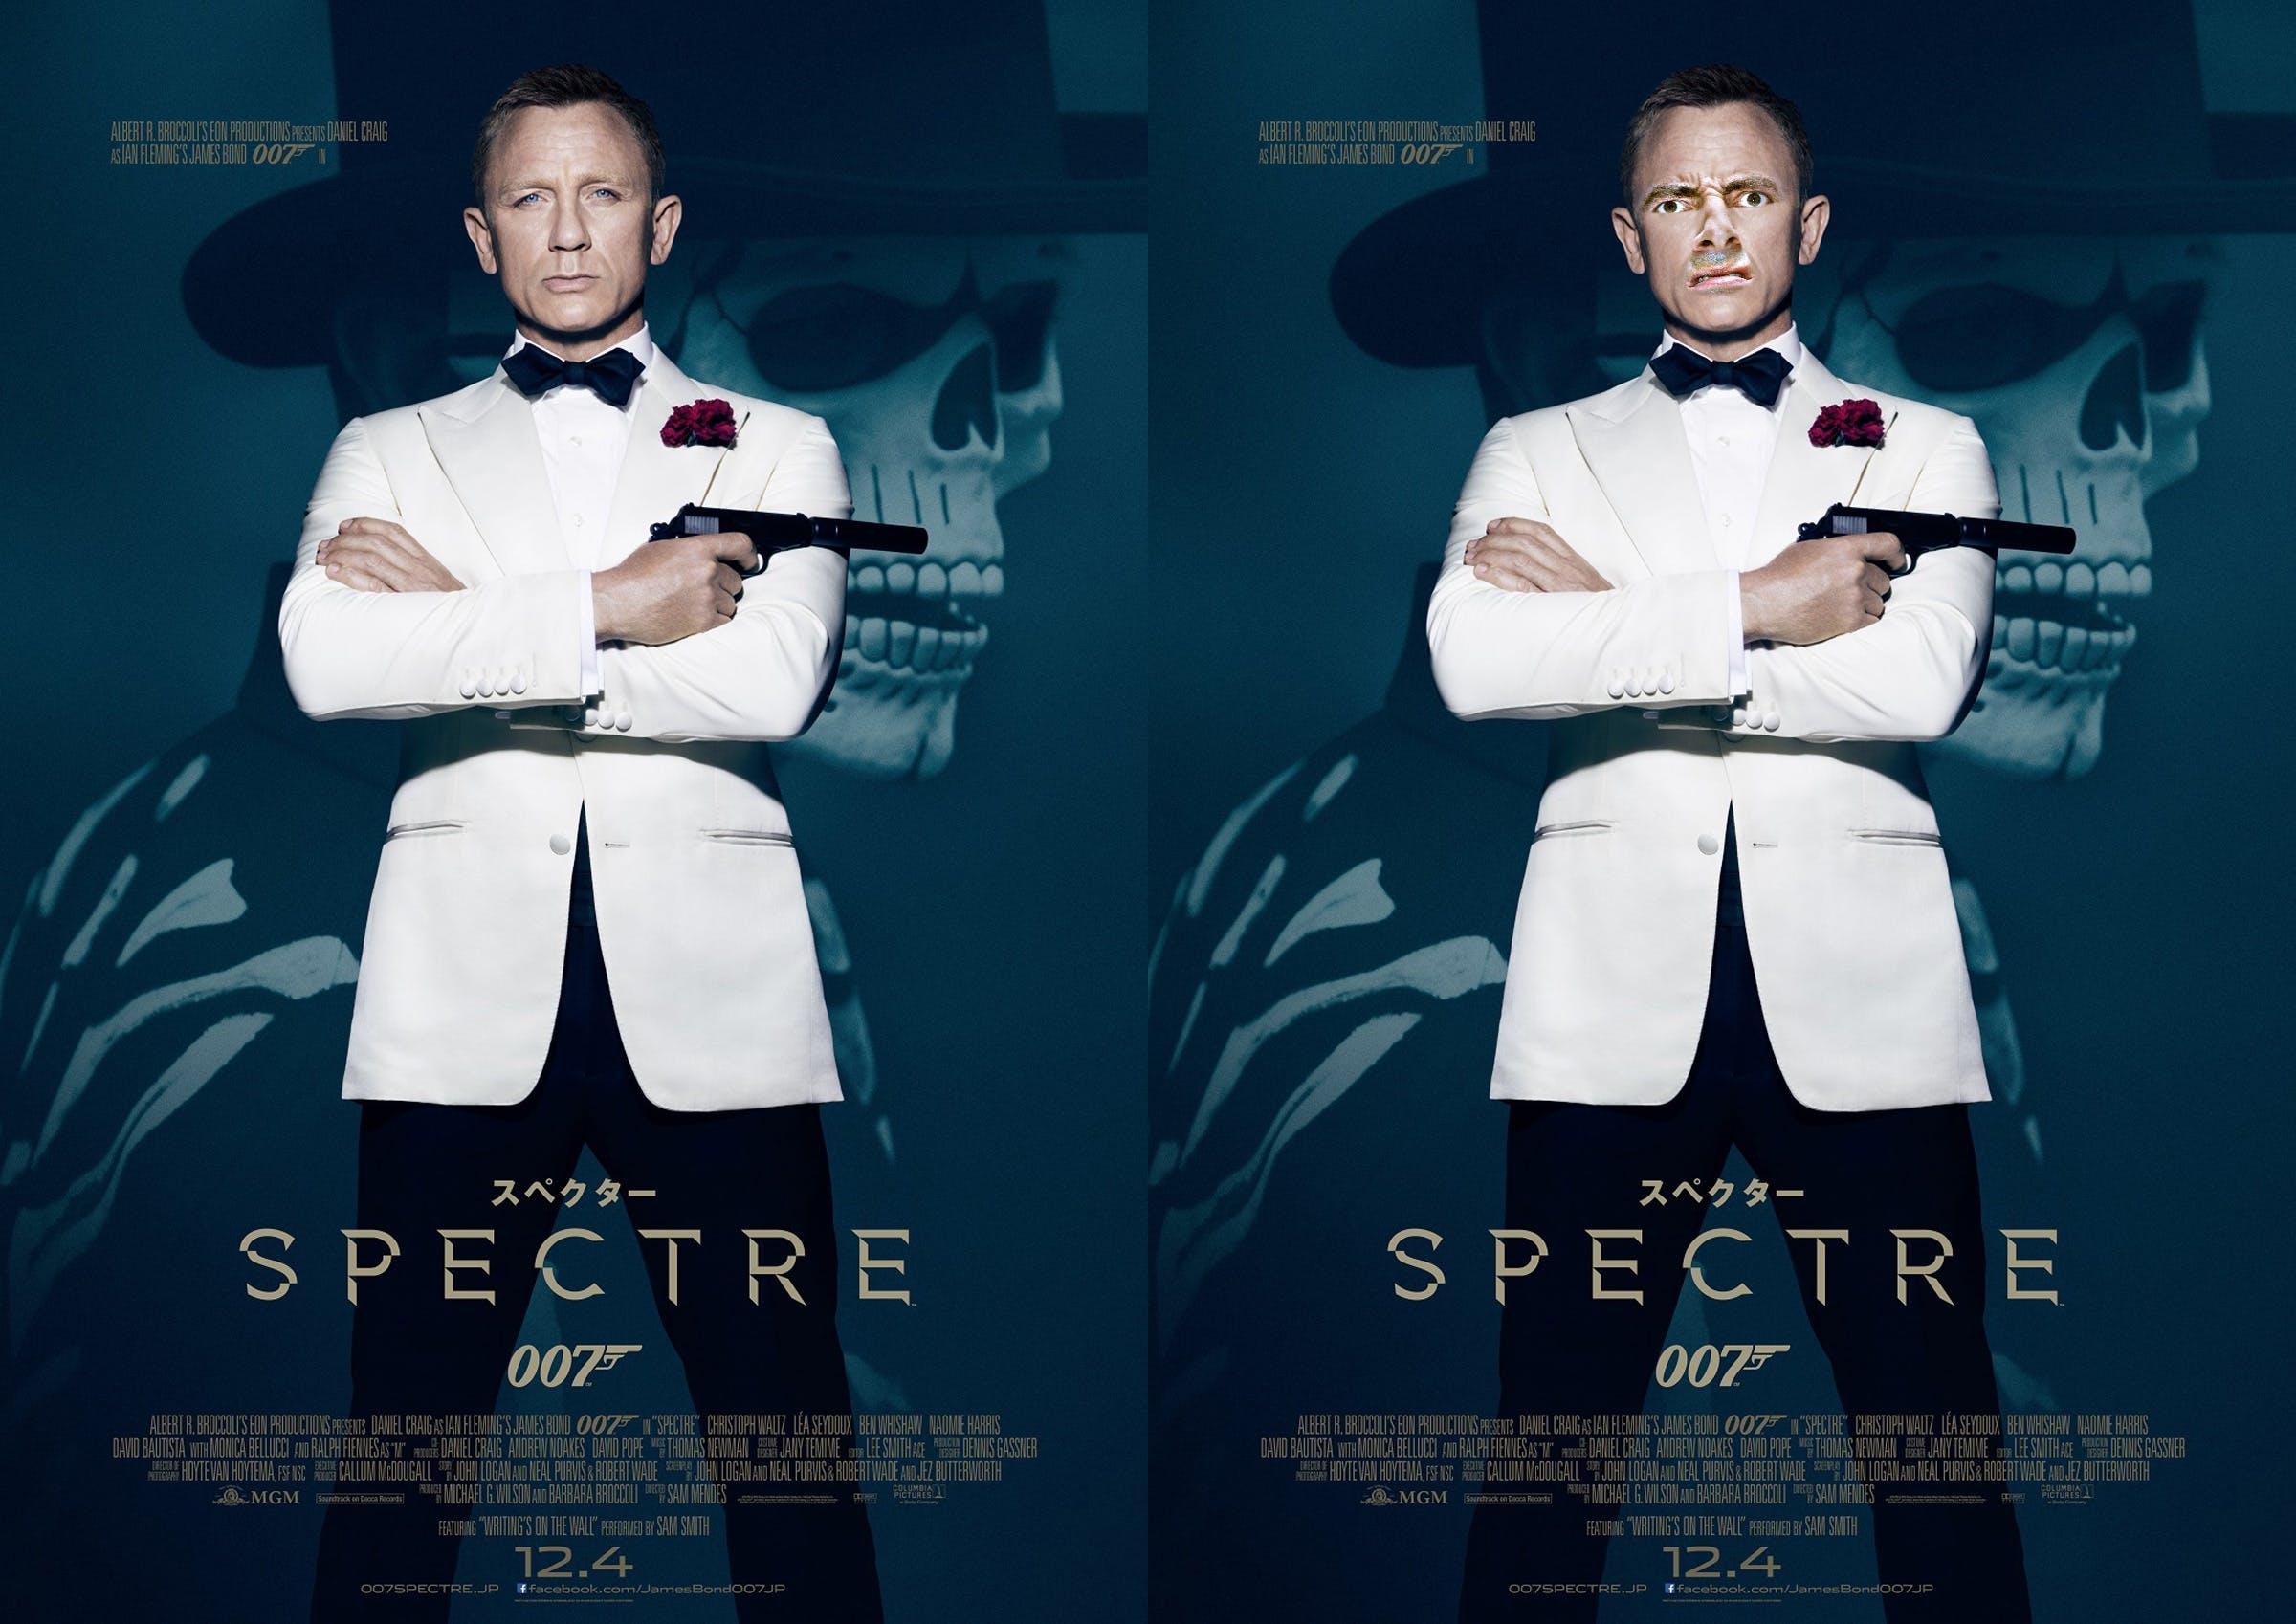 007_spectre.jpg